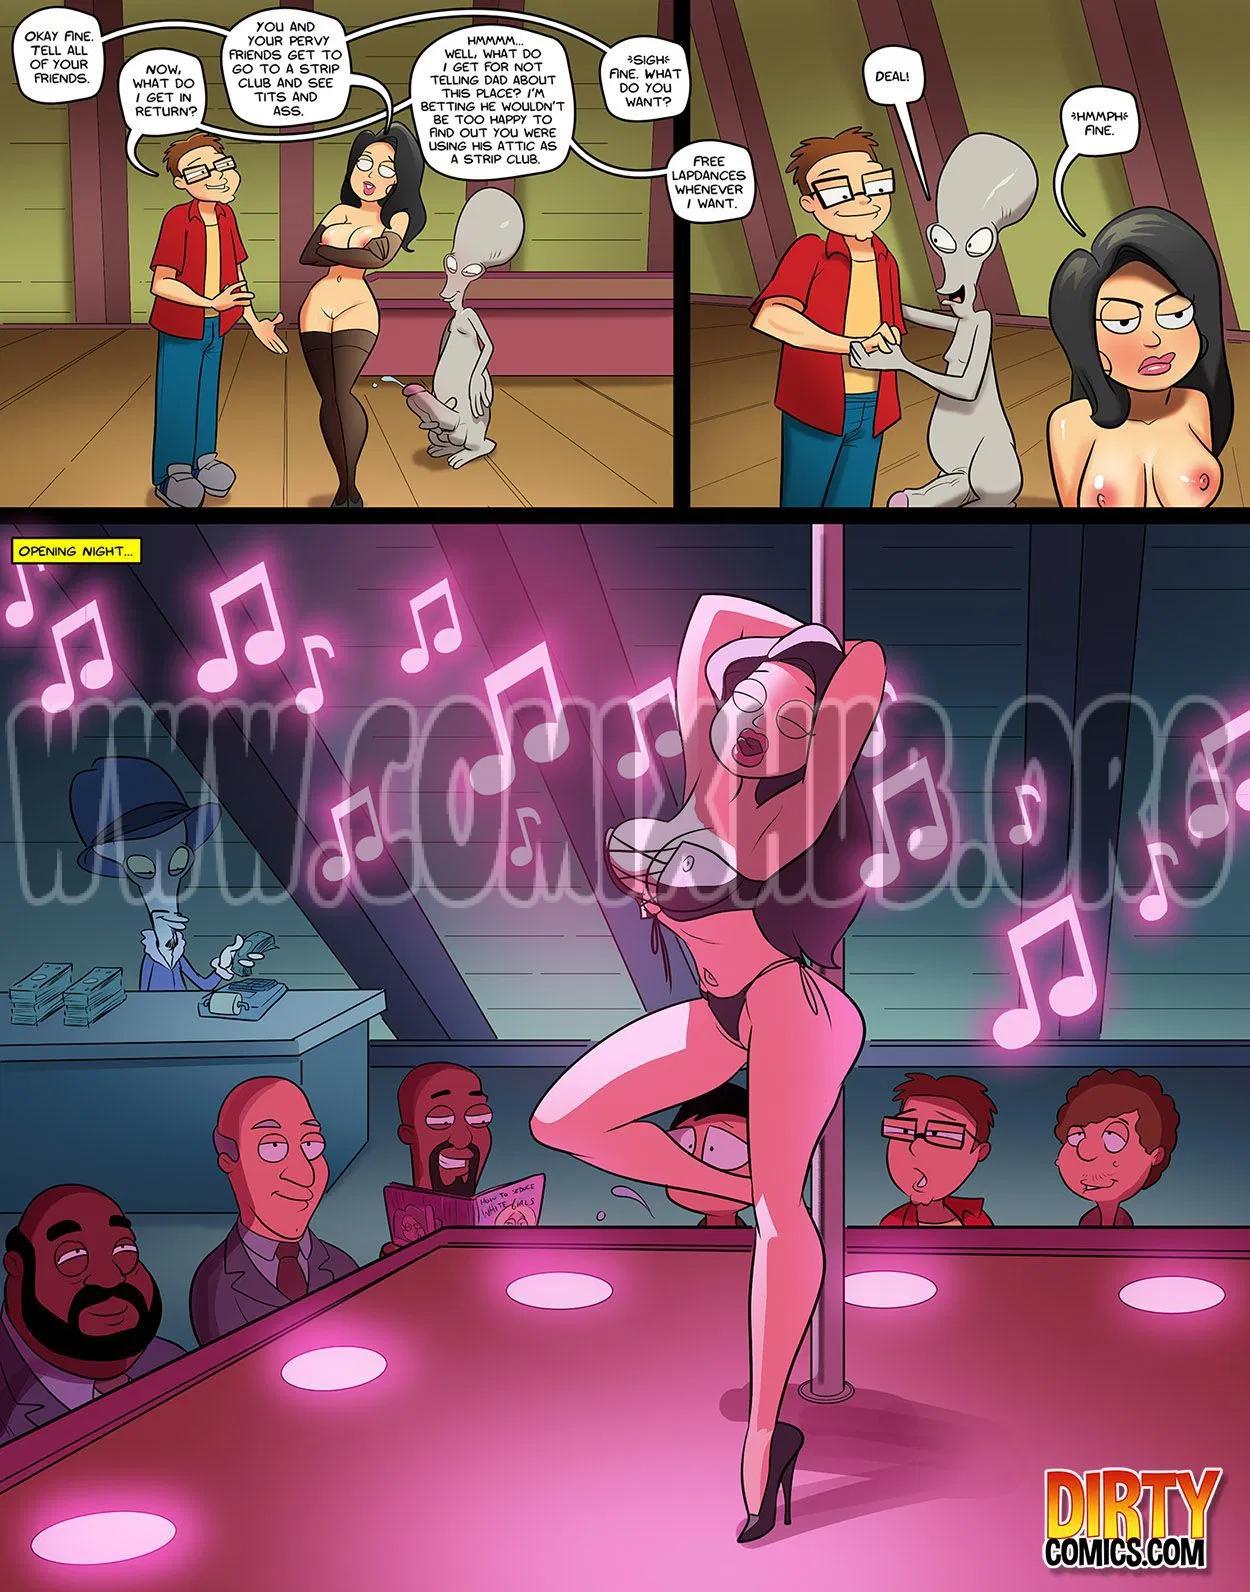 American Milf 4 Masturbation, Aliens, Anal Sex, Big Tits, Creampie, fingering, Glasses, incest, MILF, Stockings, Straight Shota